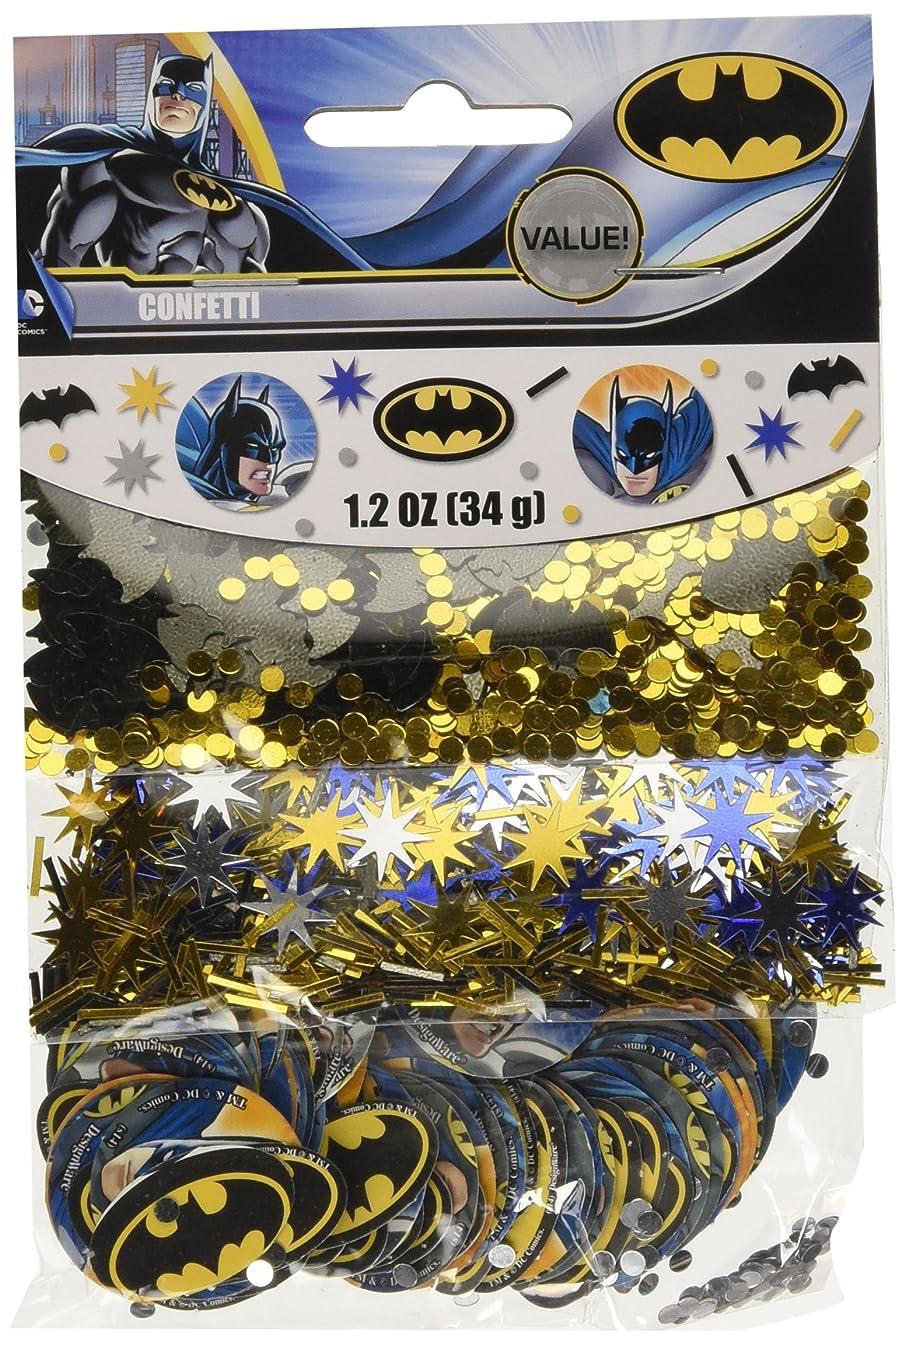 Batman Value Confetti, Party Favor